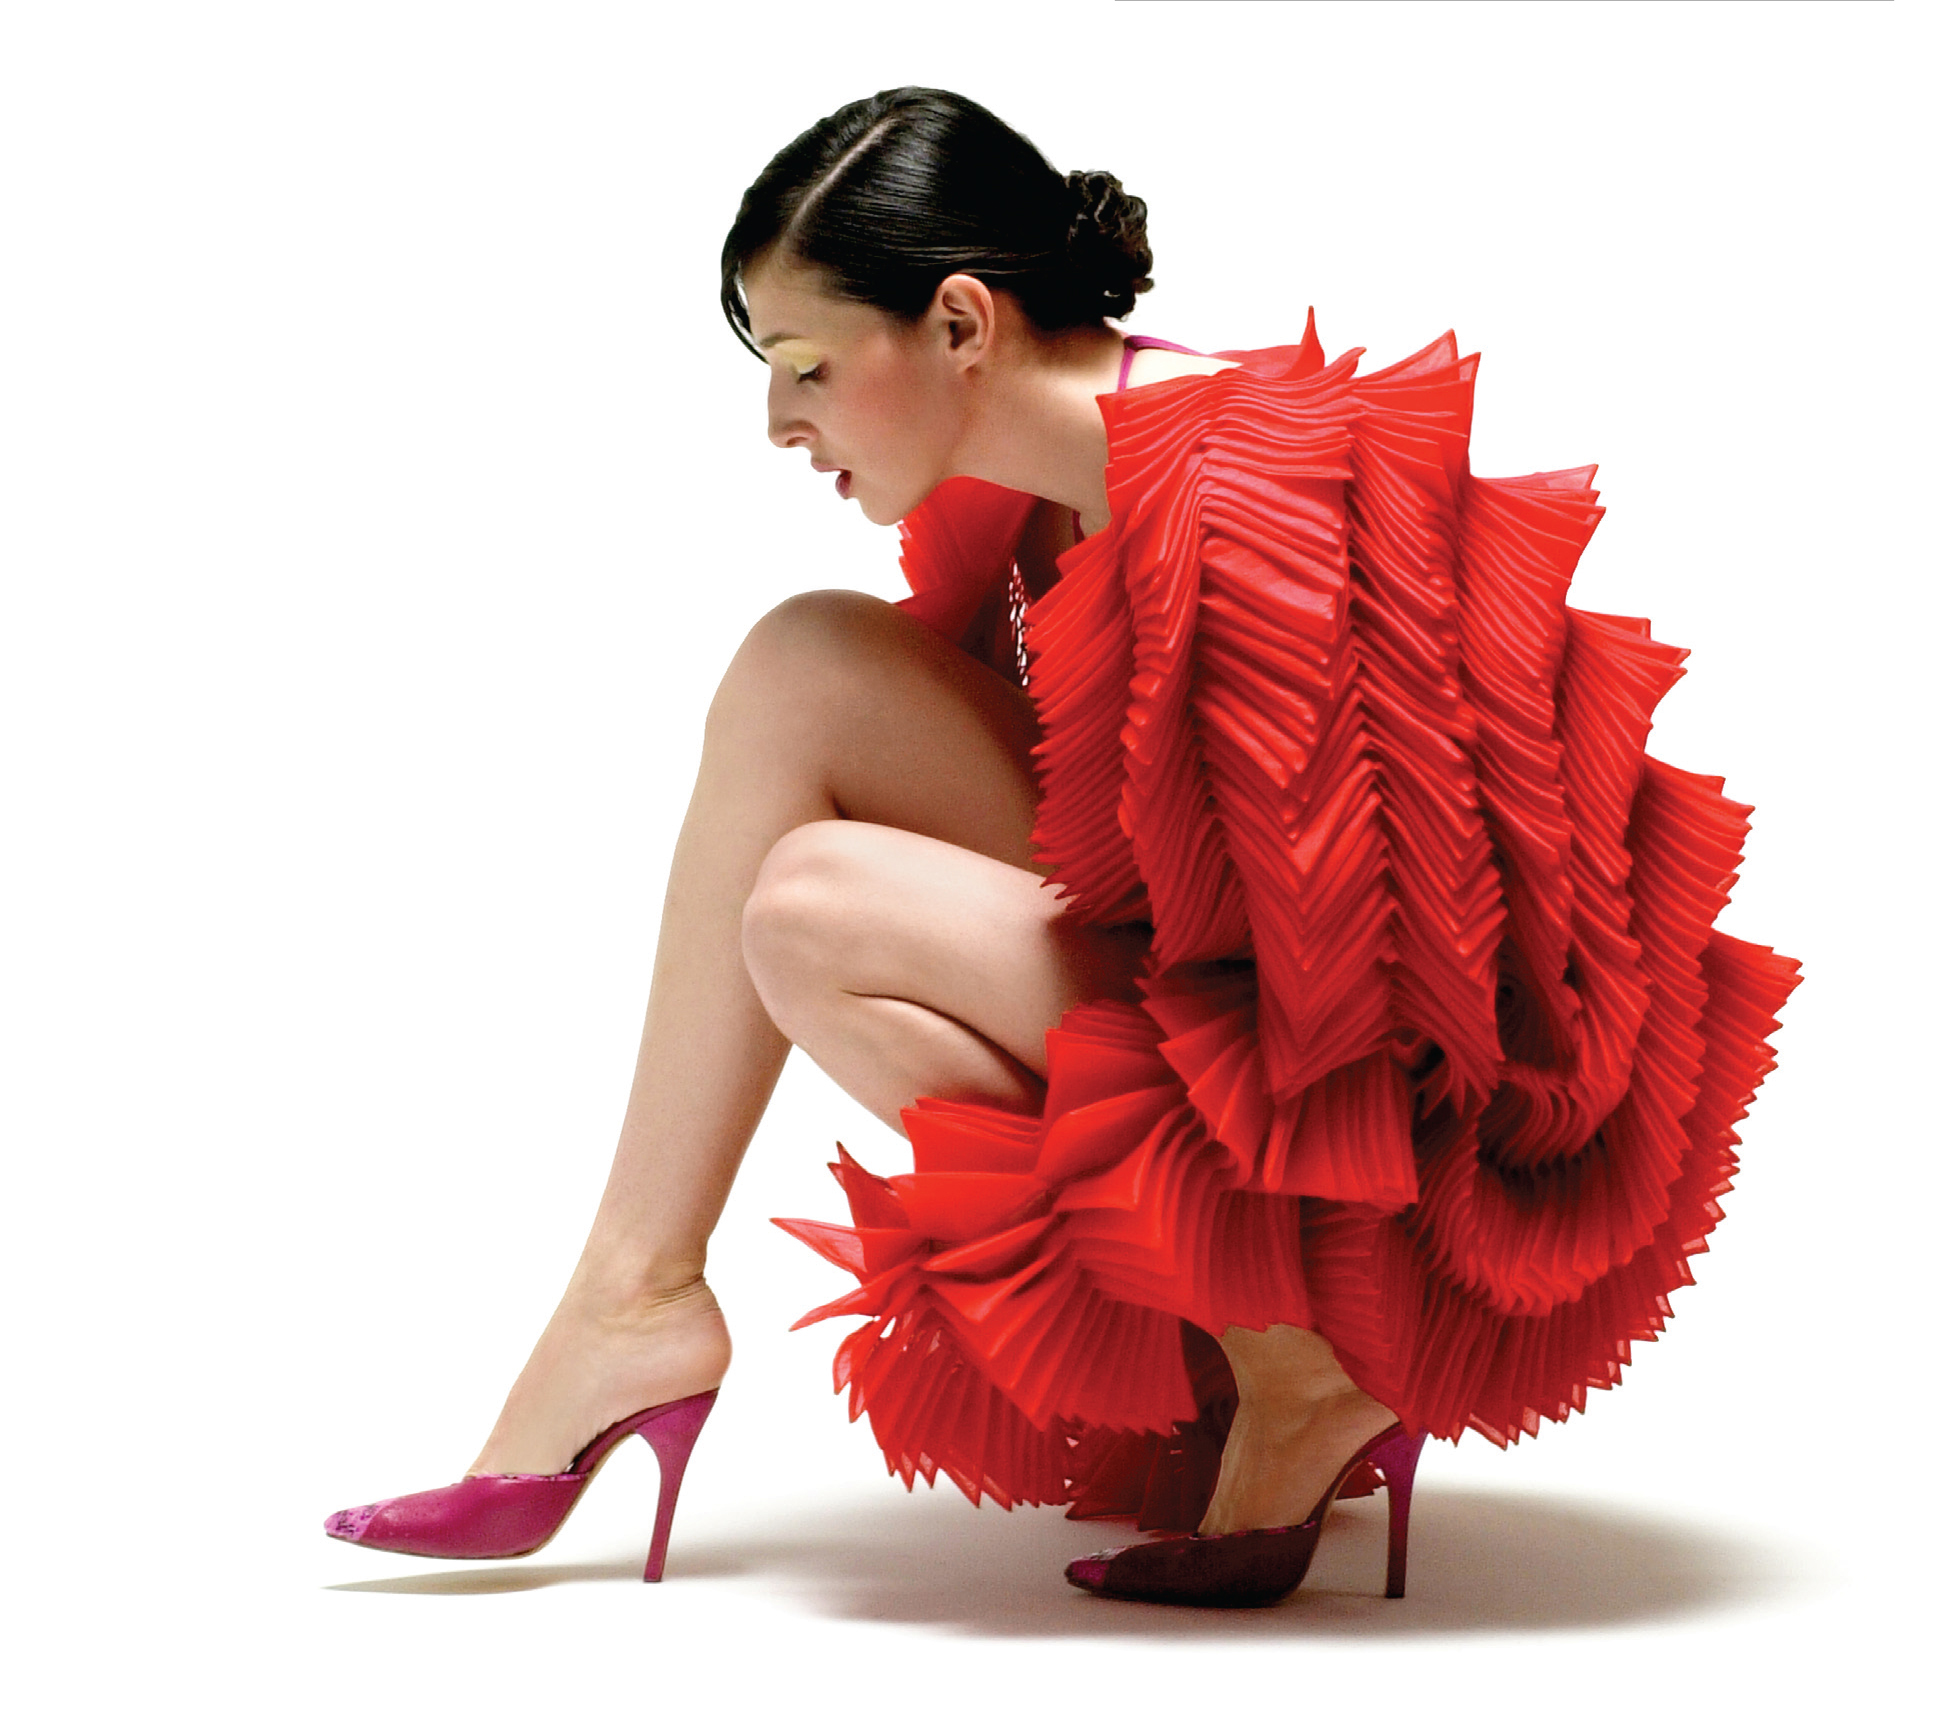 maurizio-galante-haute-couture-drago-1-ph-by-kimberly-holcomb.jpg